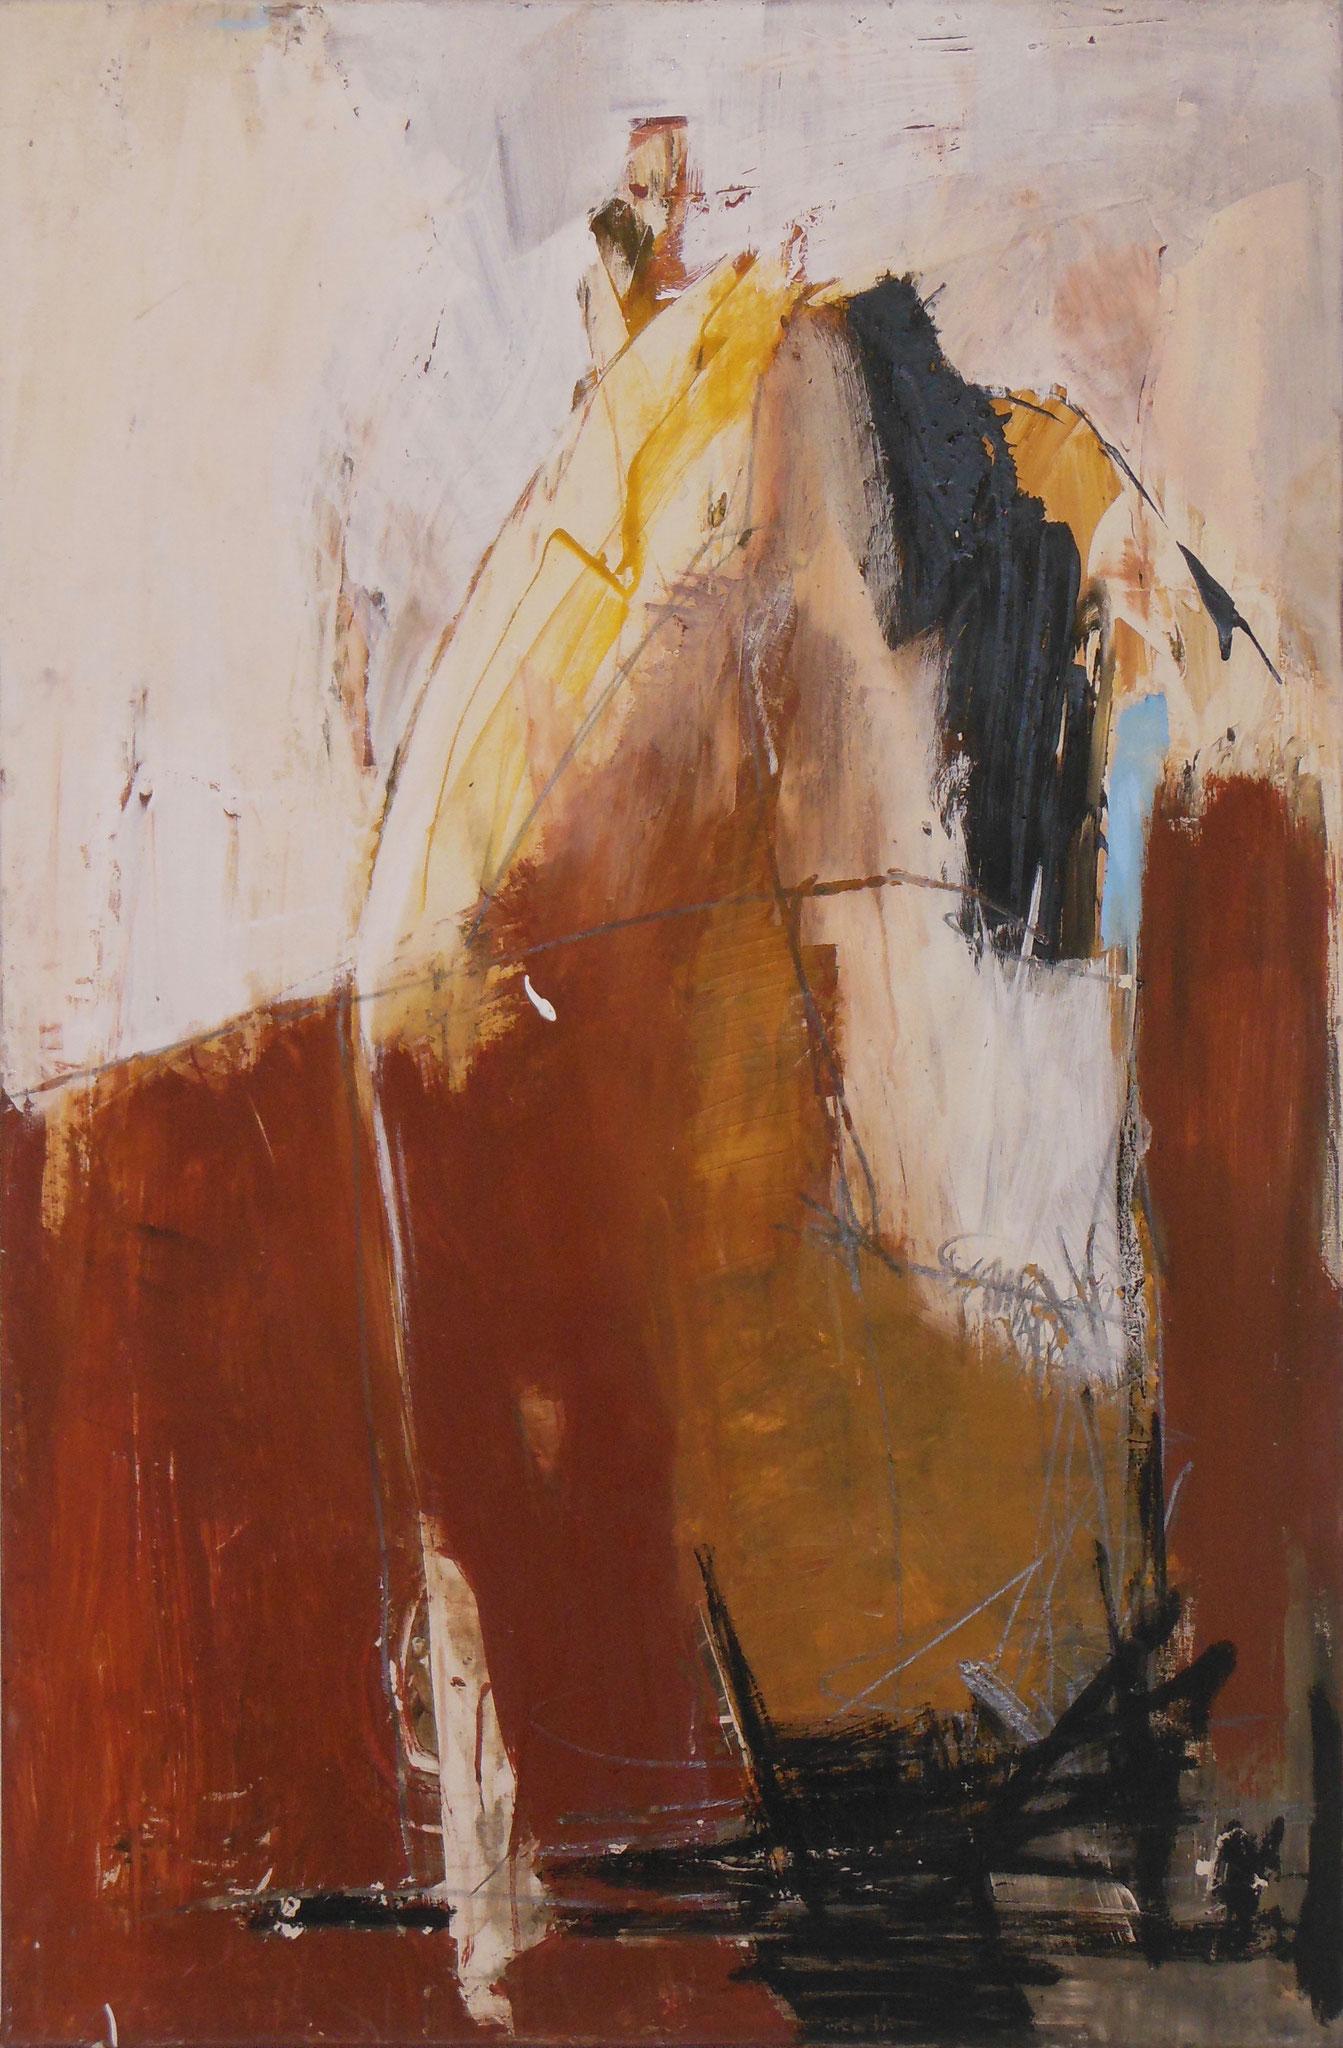 Lifelines I, 2002, 80x120cm, Mischtechnik / Leinwand